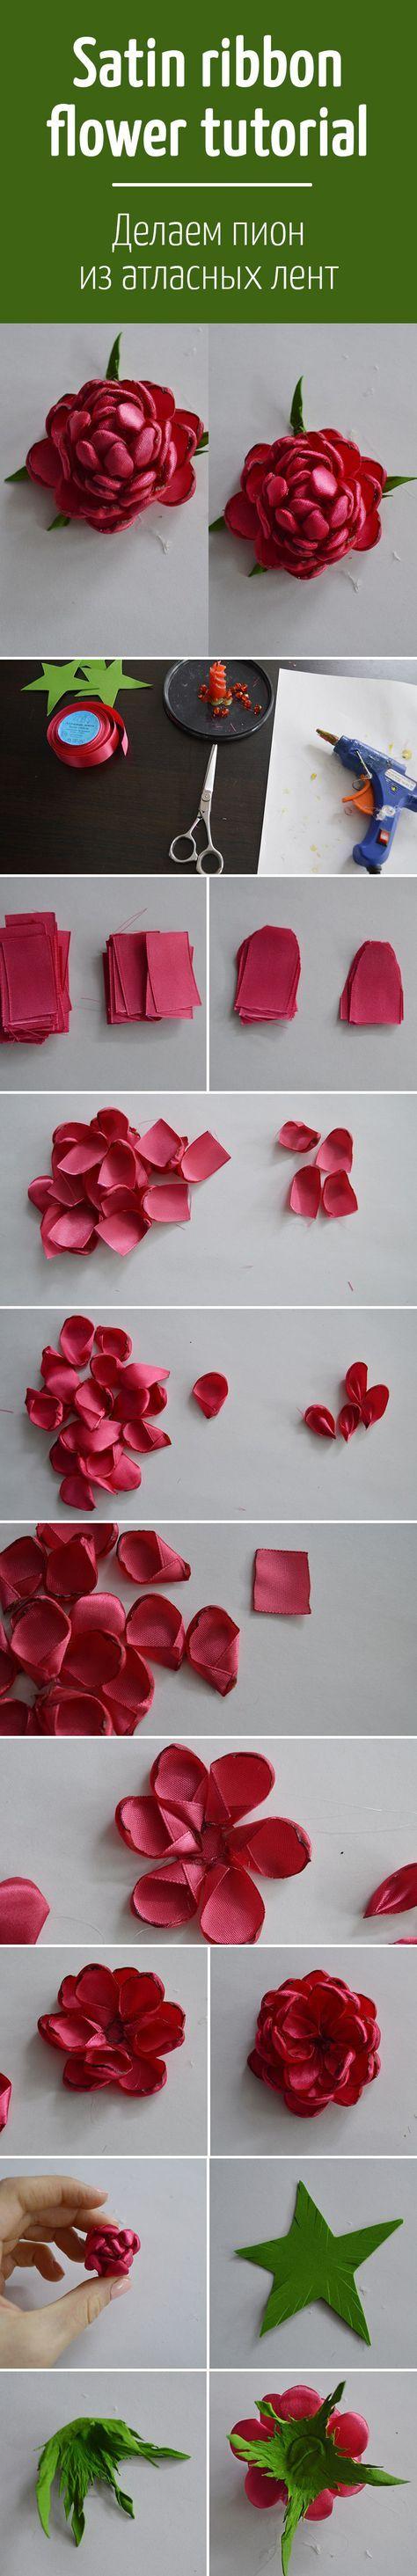 Satin Ribbon Flower Tutorial